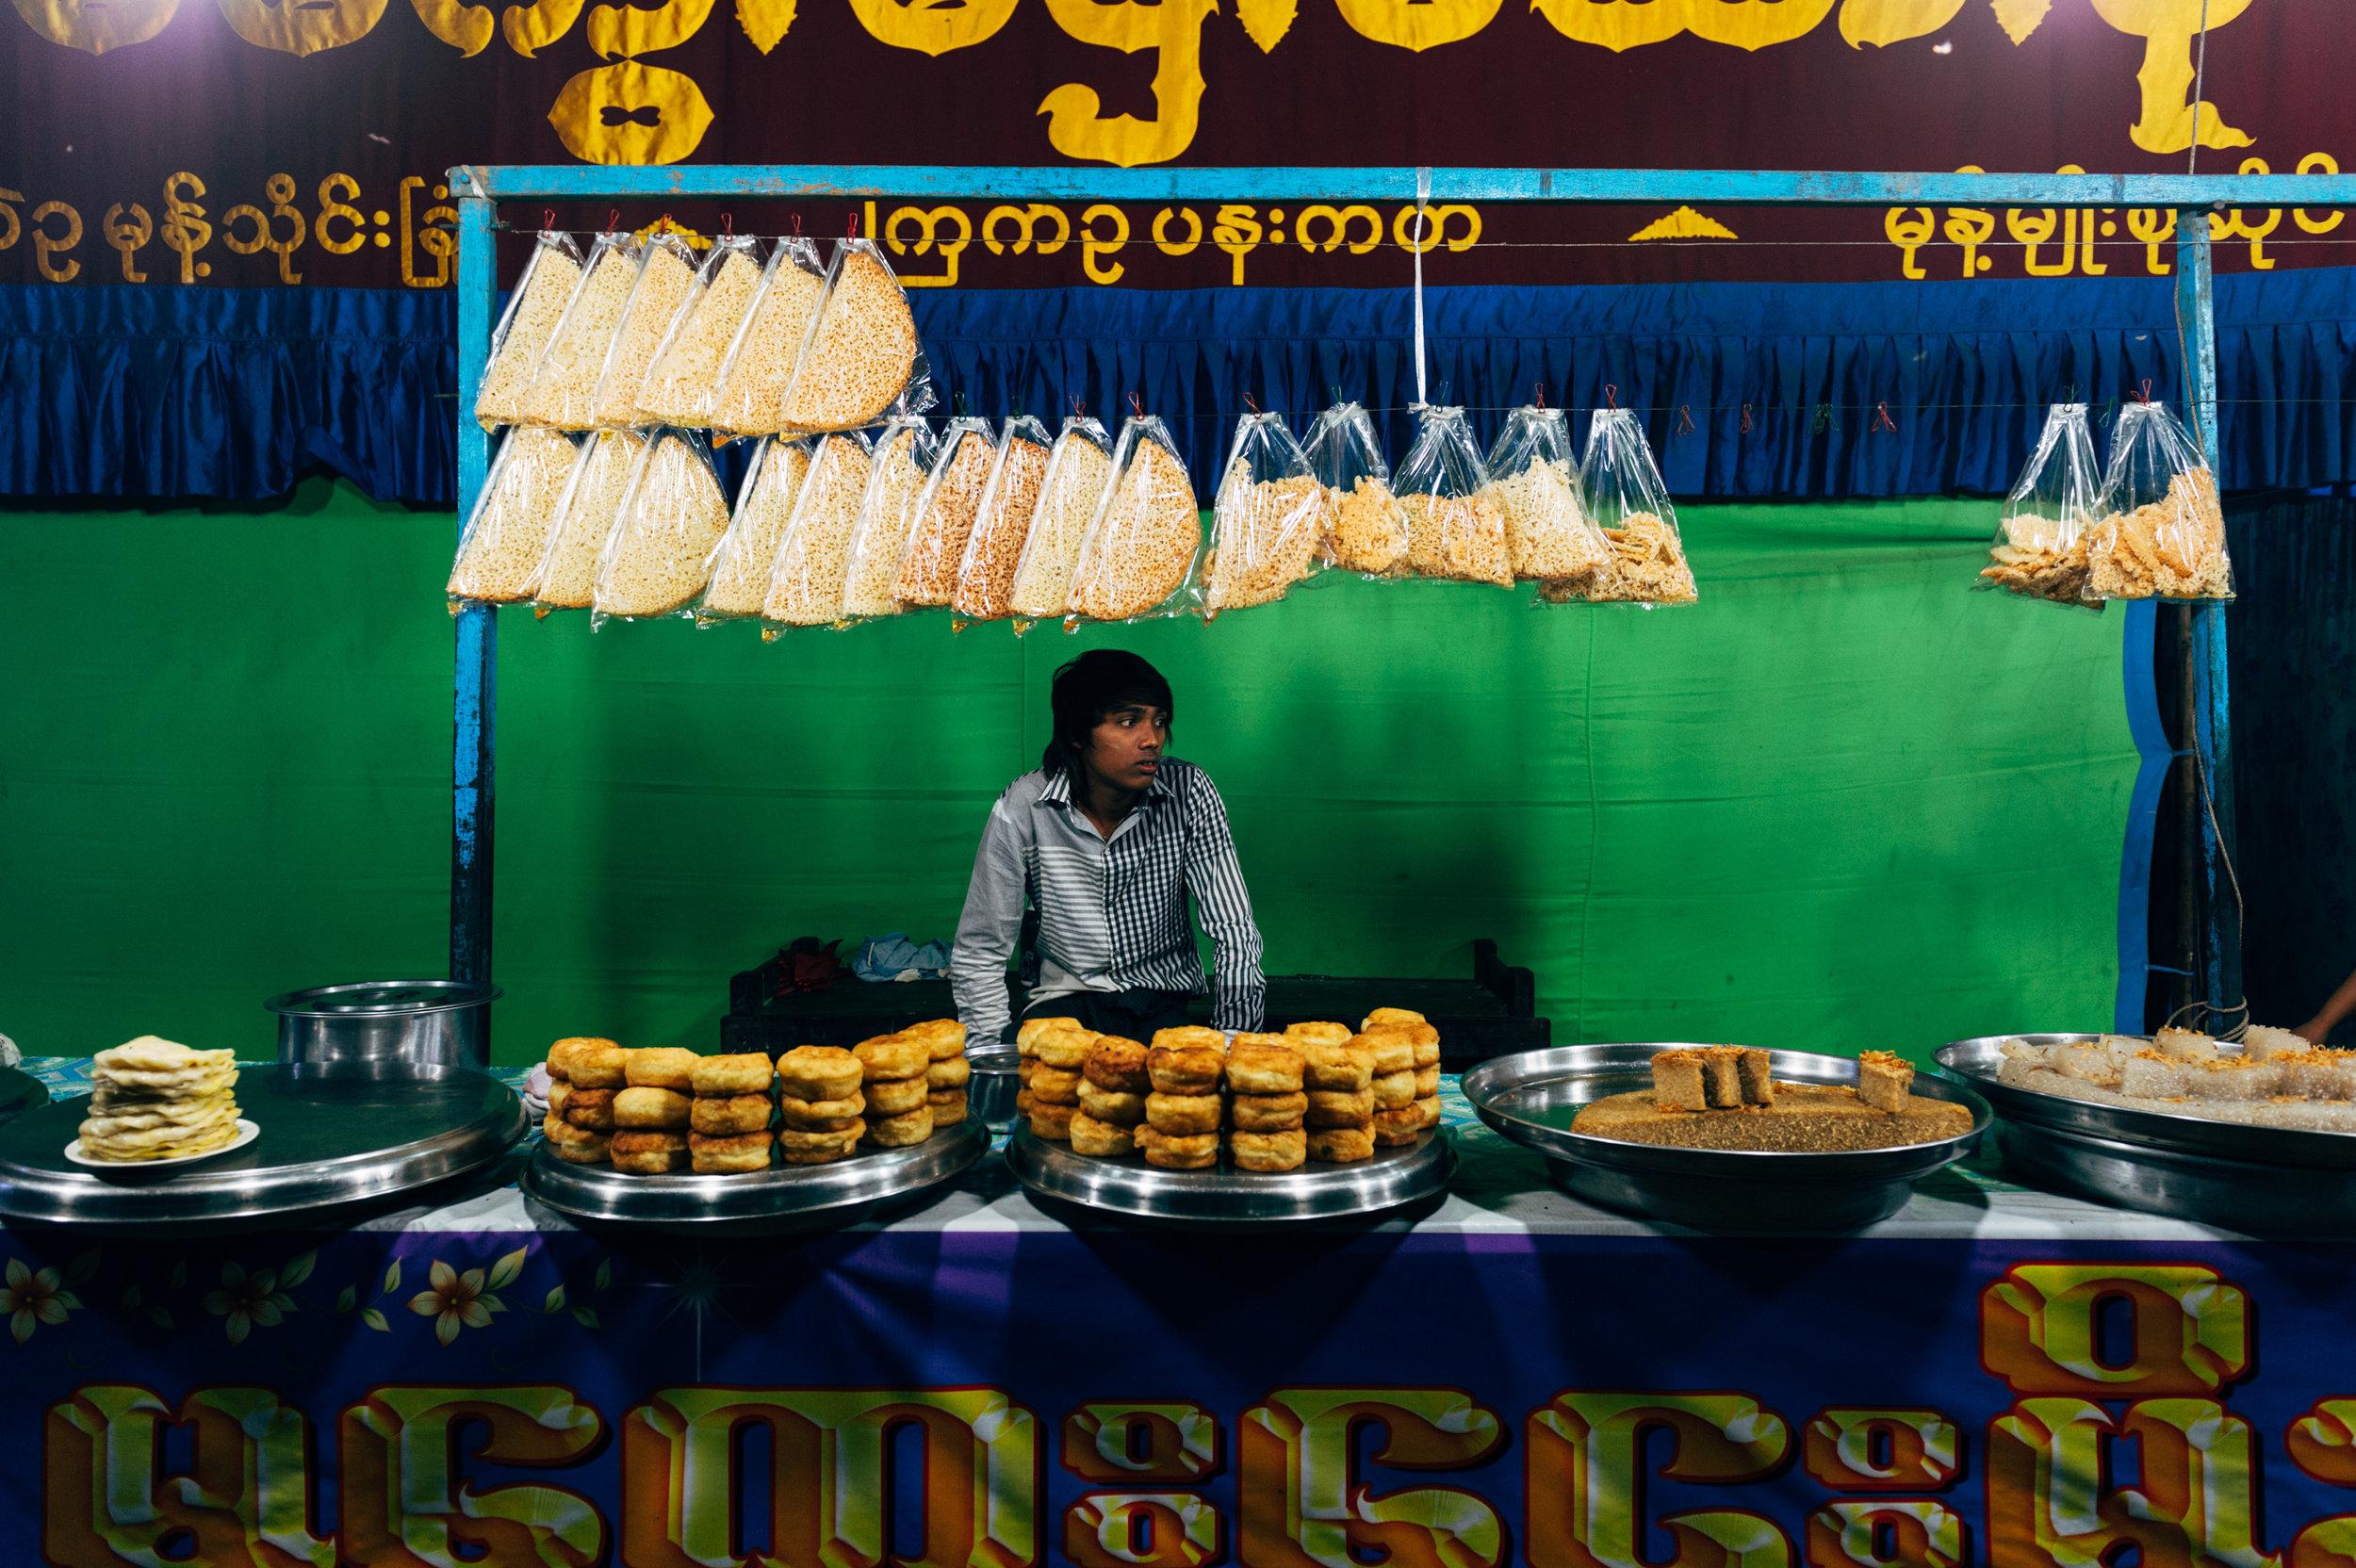 Photo Rhetoric - To Be Determined - Burma-5010.jpg